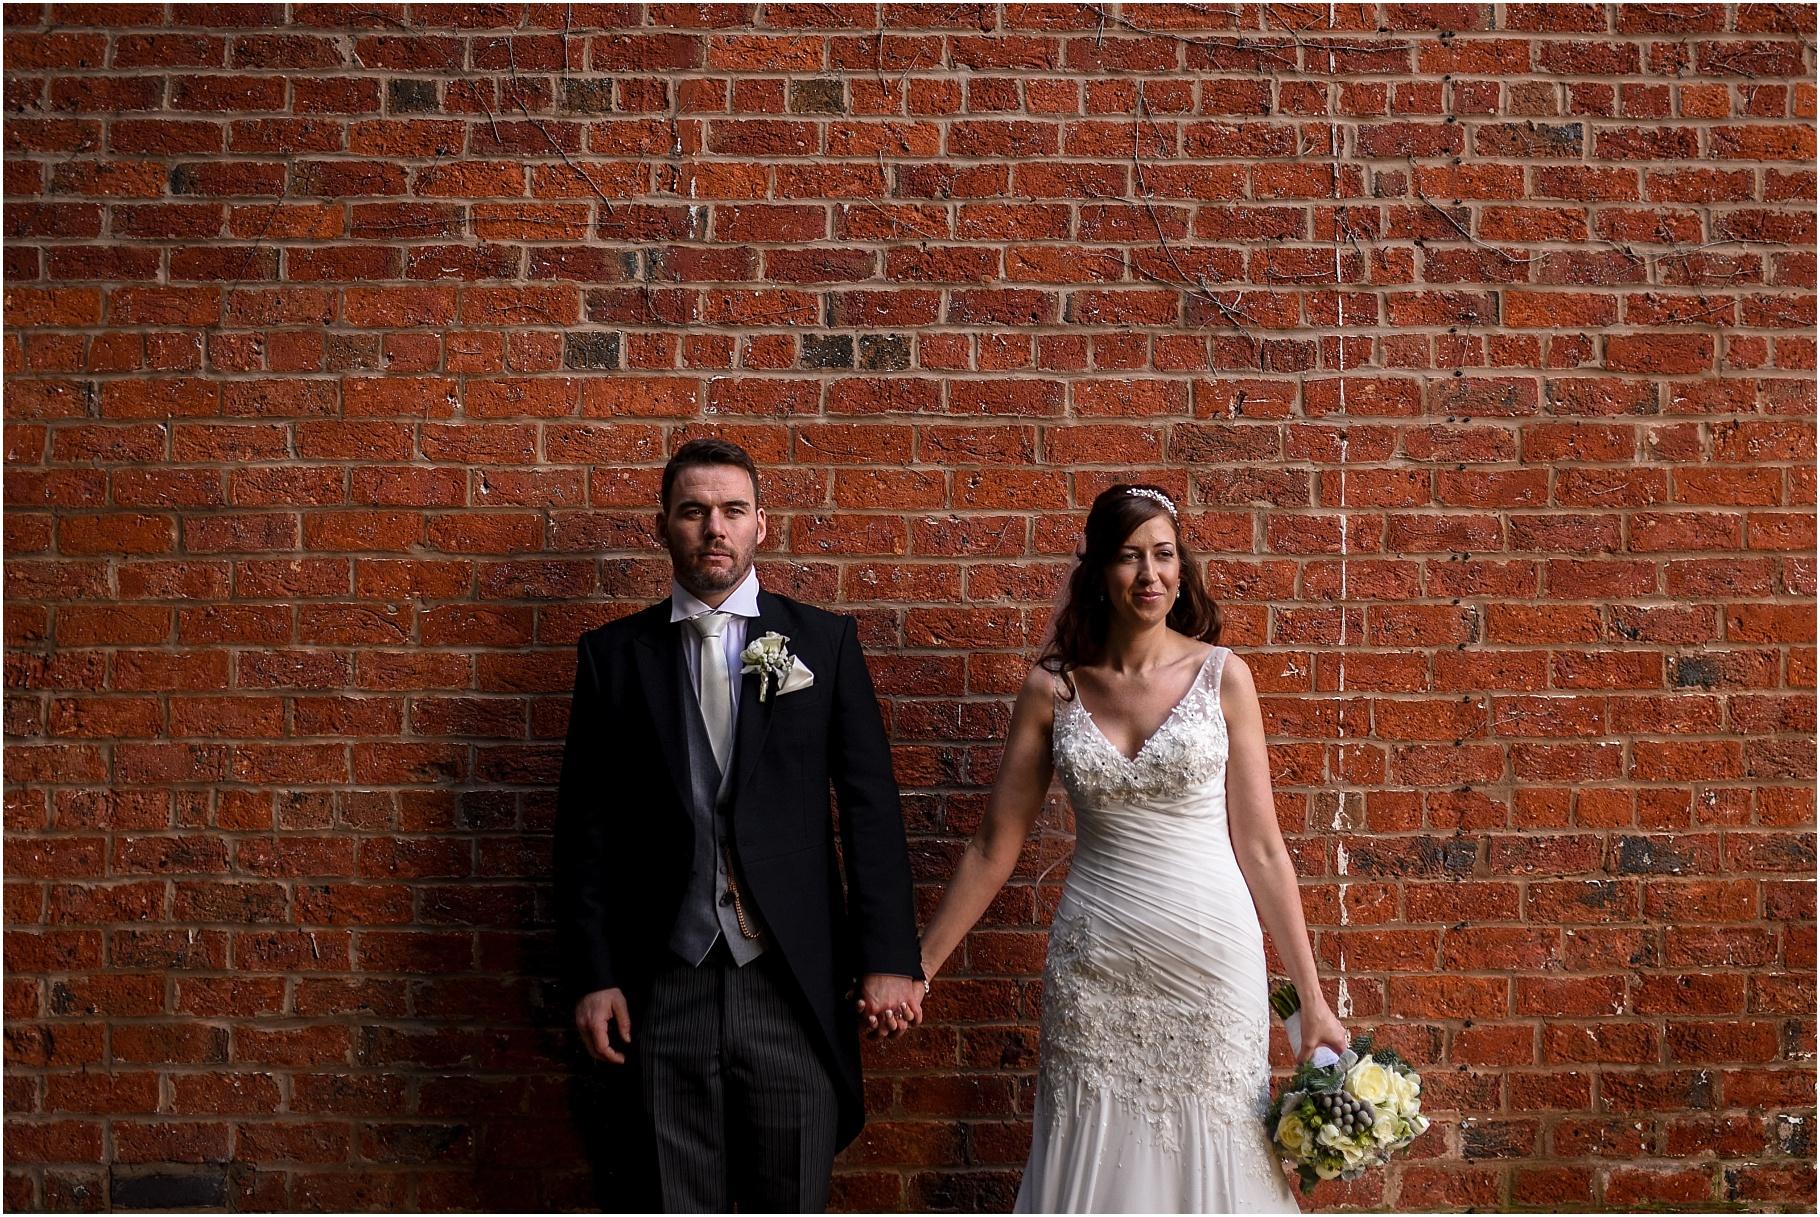 bartle-hall-wedding-40.jpg